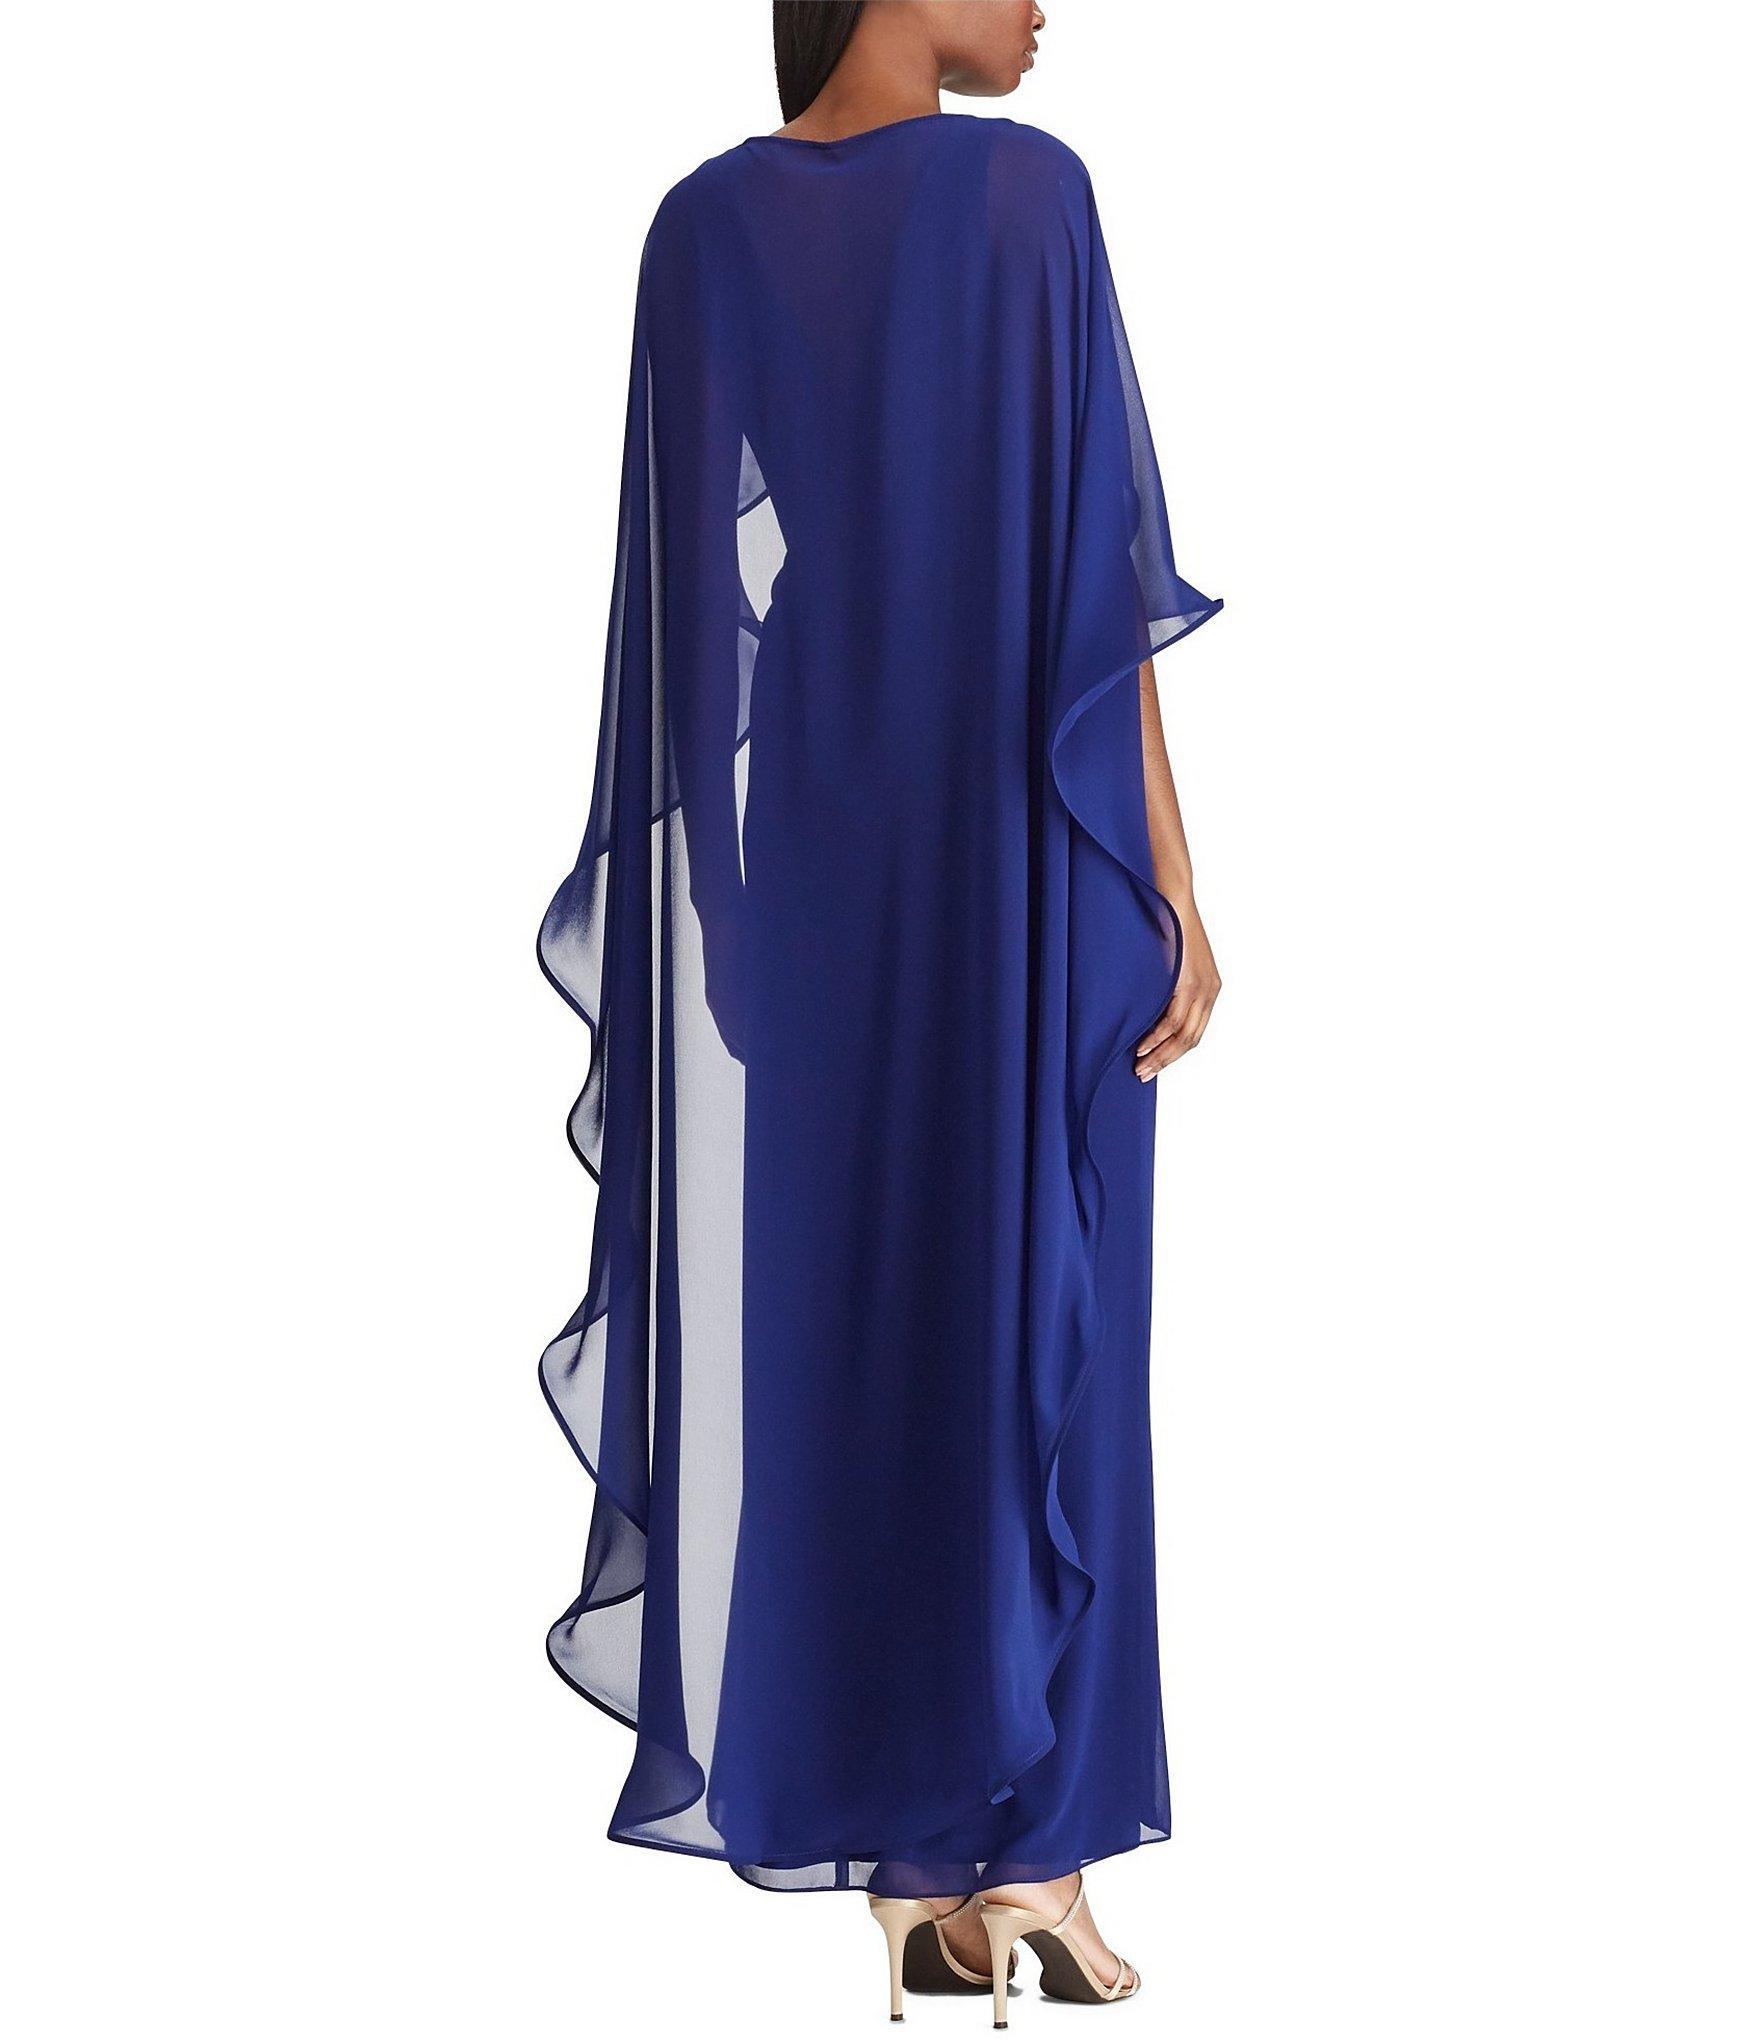 512d1c7ada6 Lauren by Ralph Lauren - Blue Cape Overlay Georgette Gown - Lyst. View  fullscreen